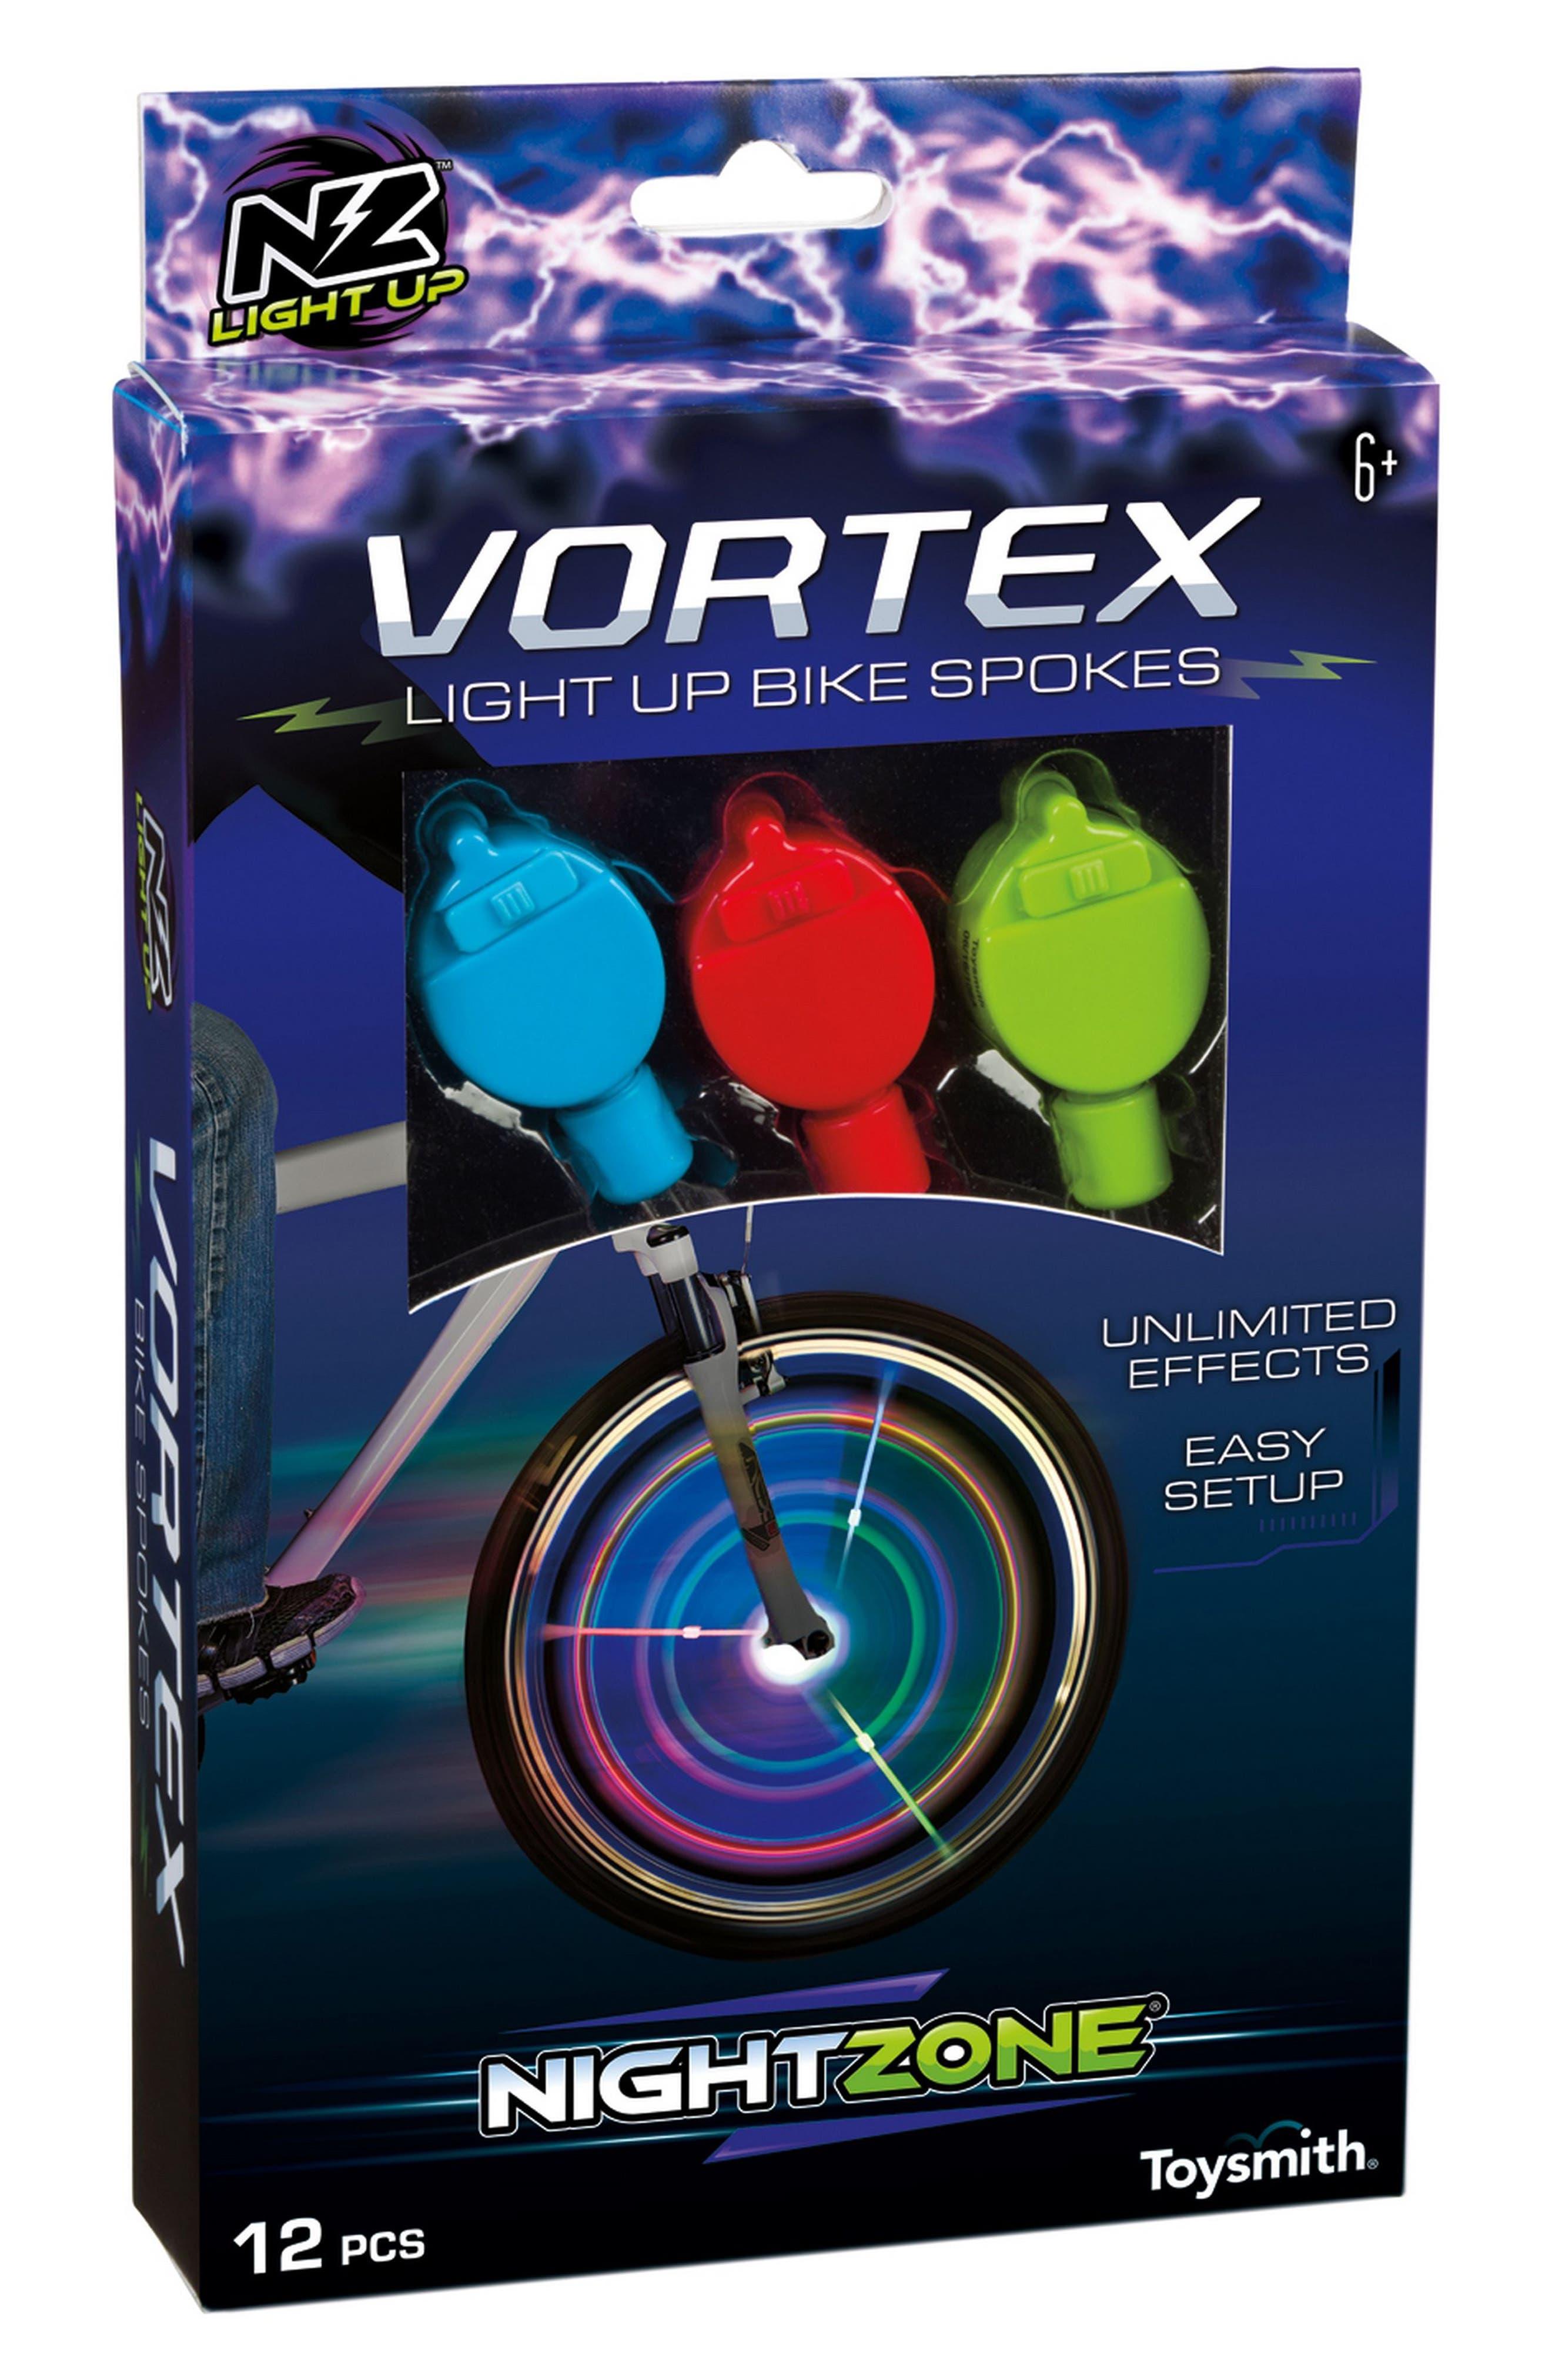 Nightzone Vortex Light-Up Bike Spokes,                         Main,                         color, Red